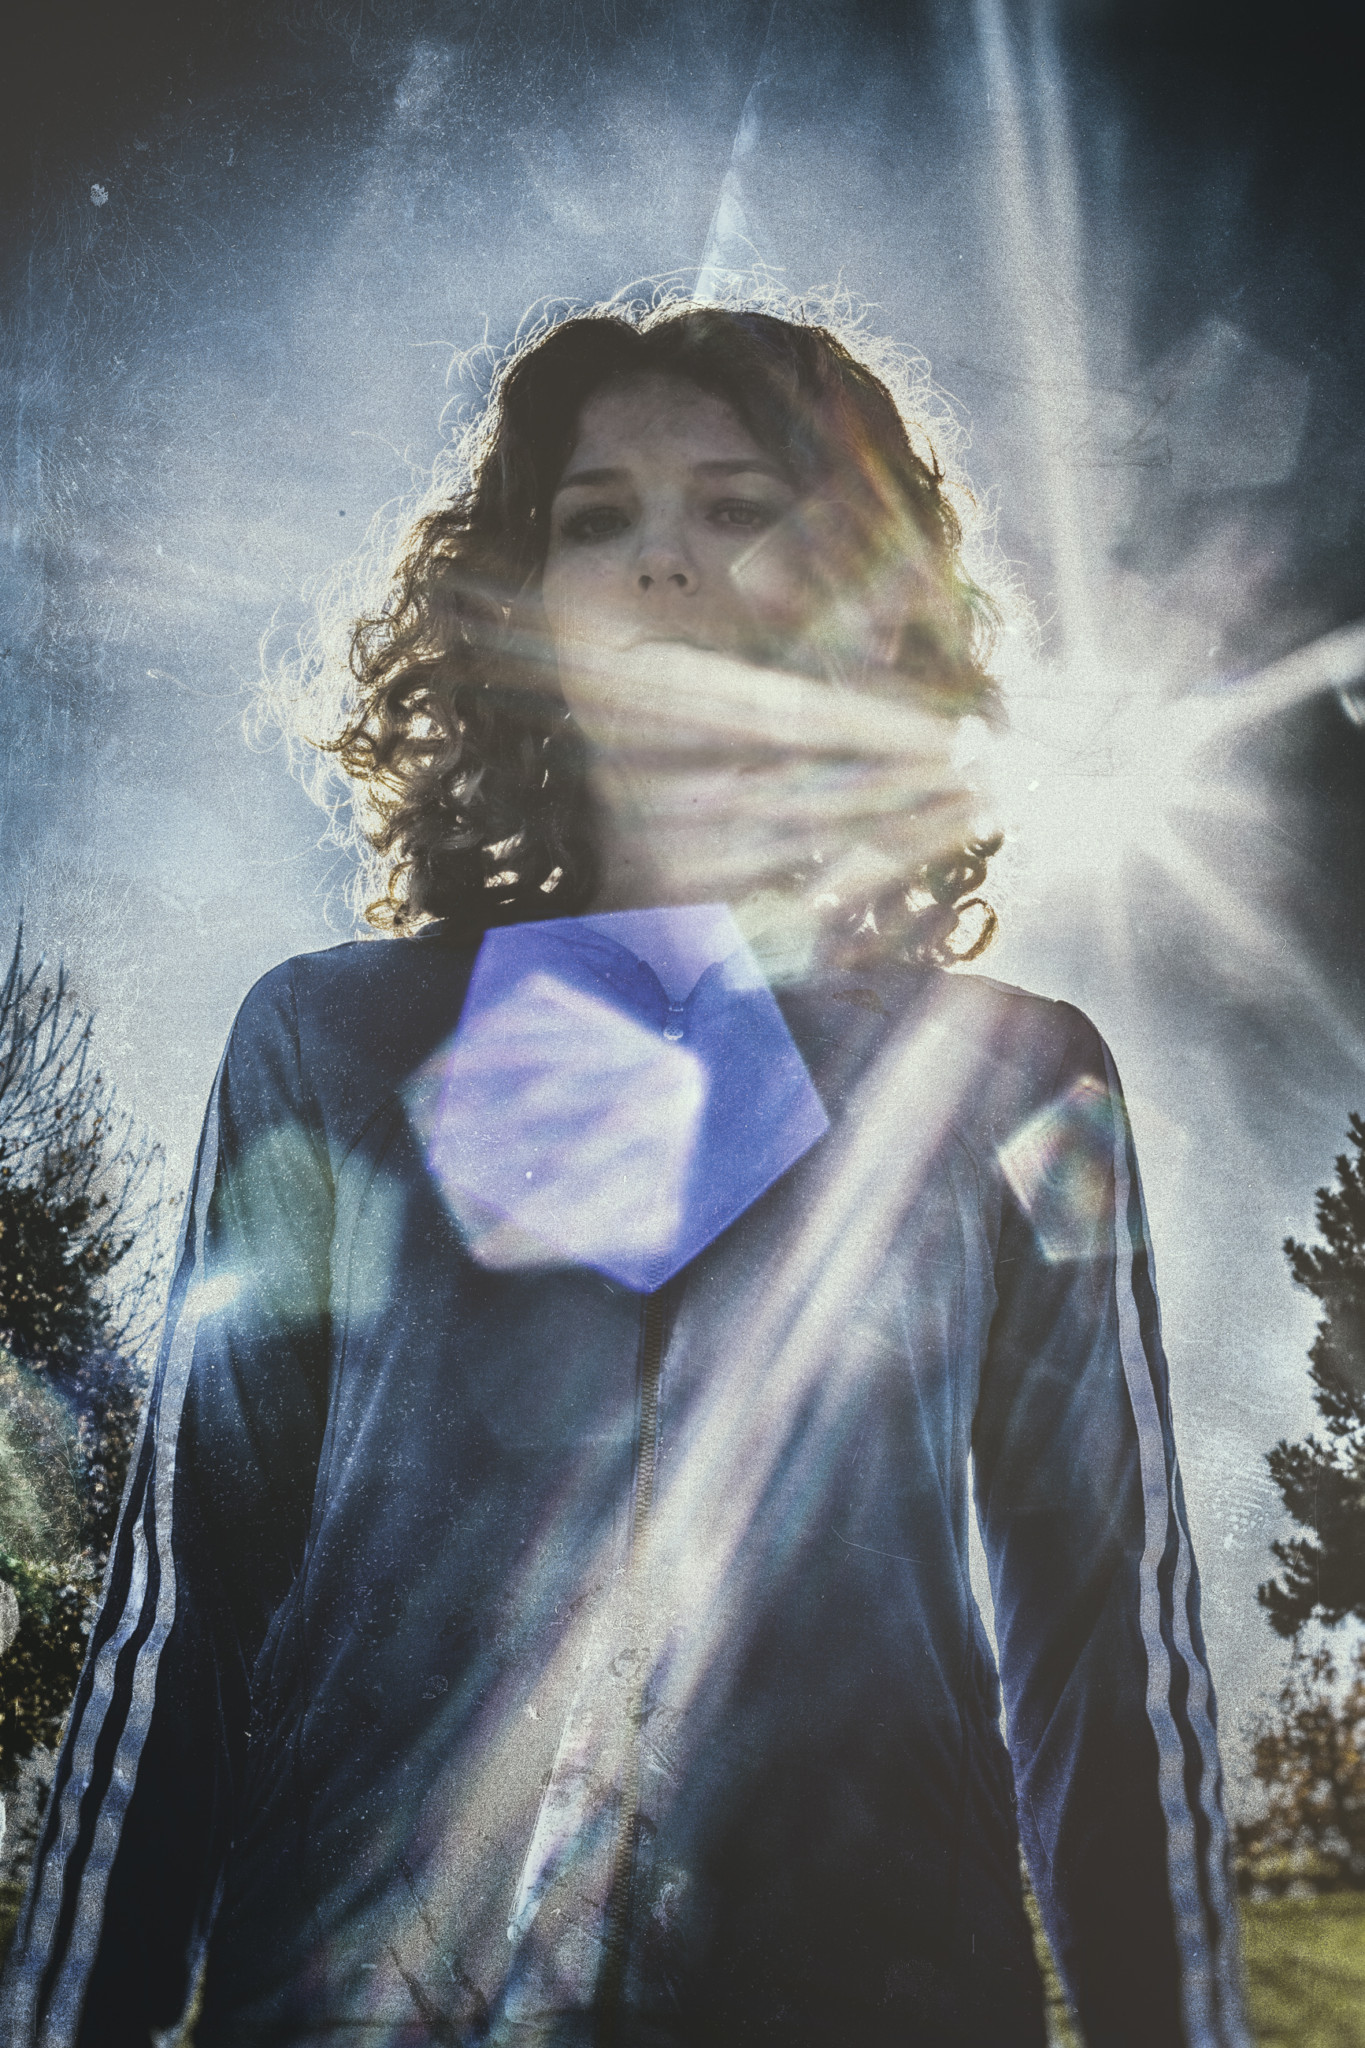 Merna El-Mohasel-Der-Herbst-hat-viele-Farben-Blau-ist-meine-Herbstfarbe